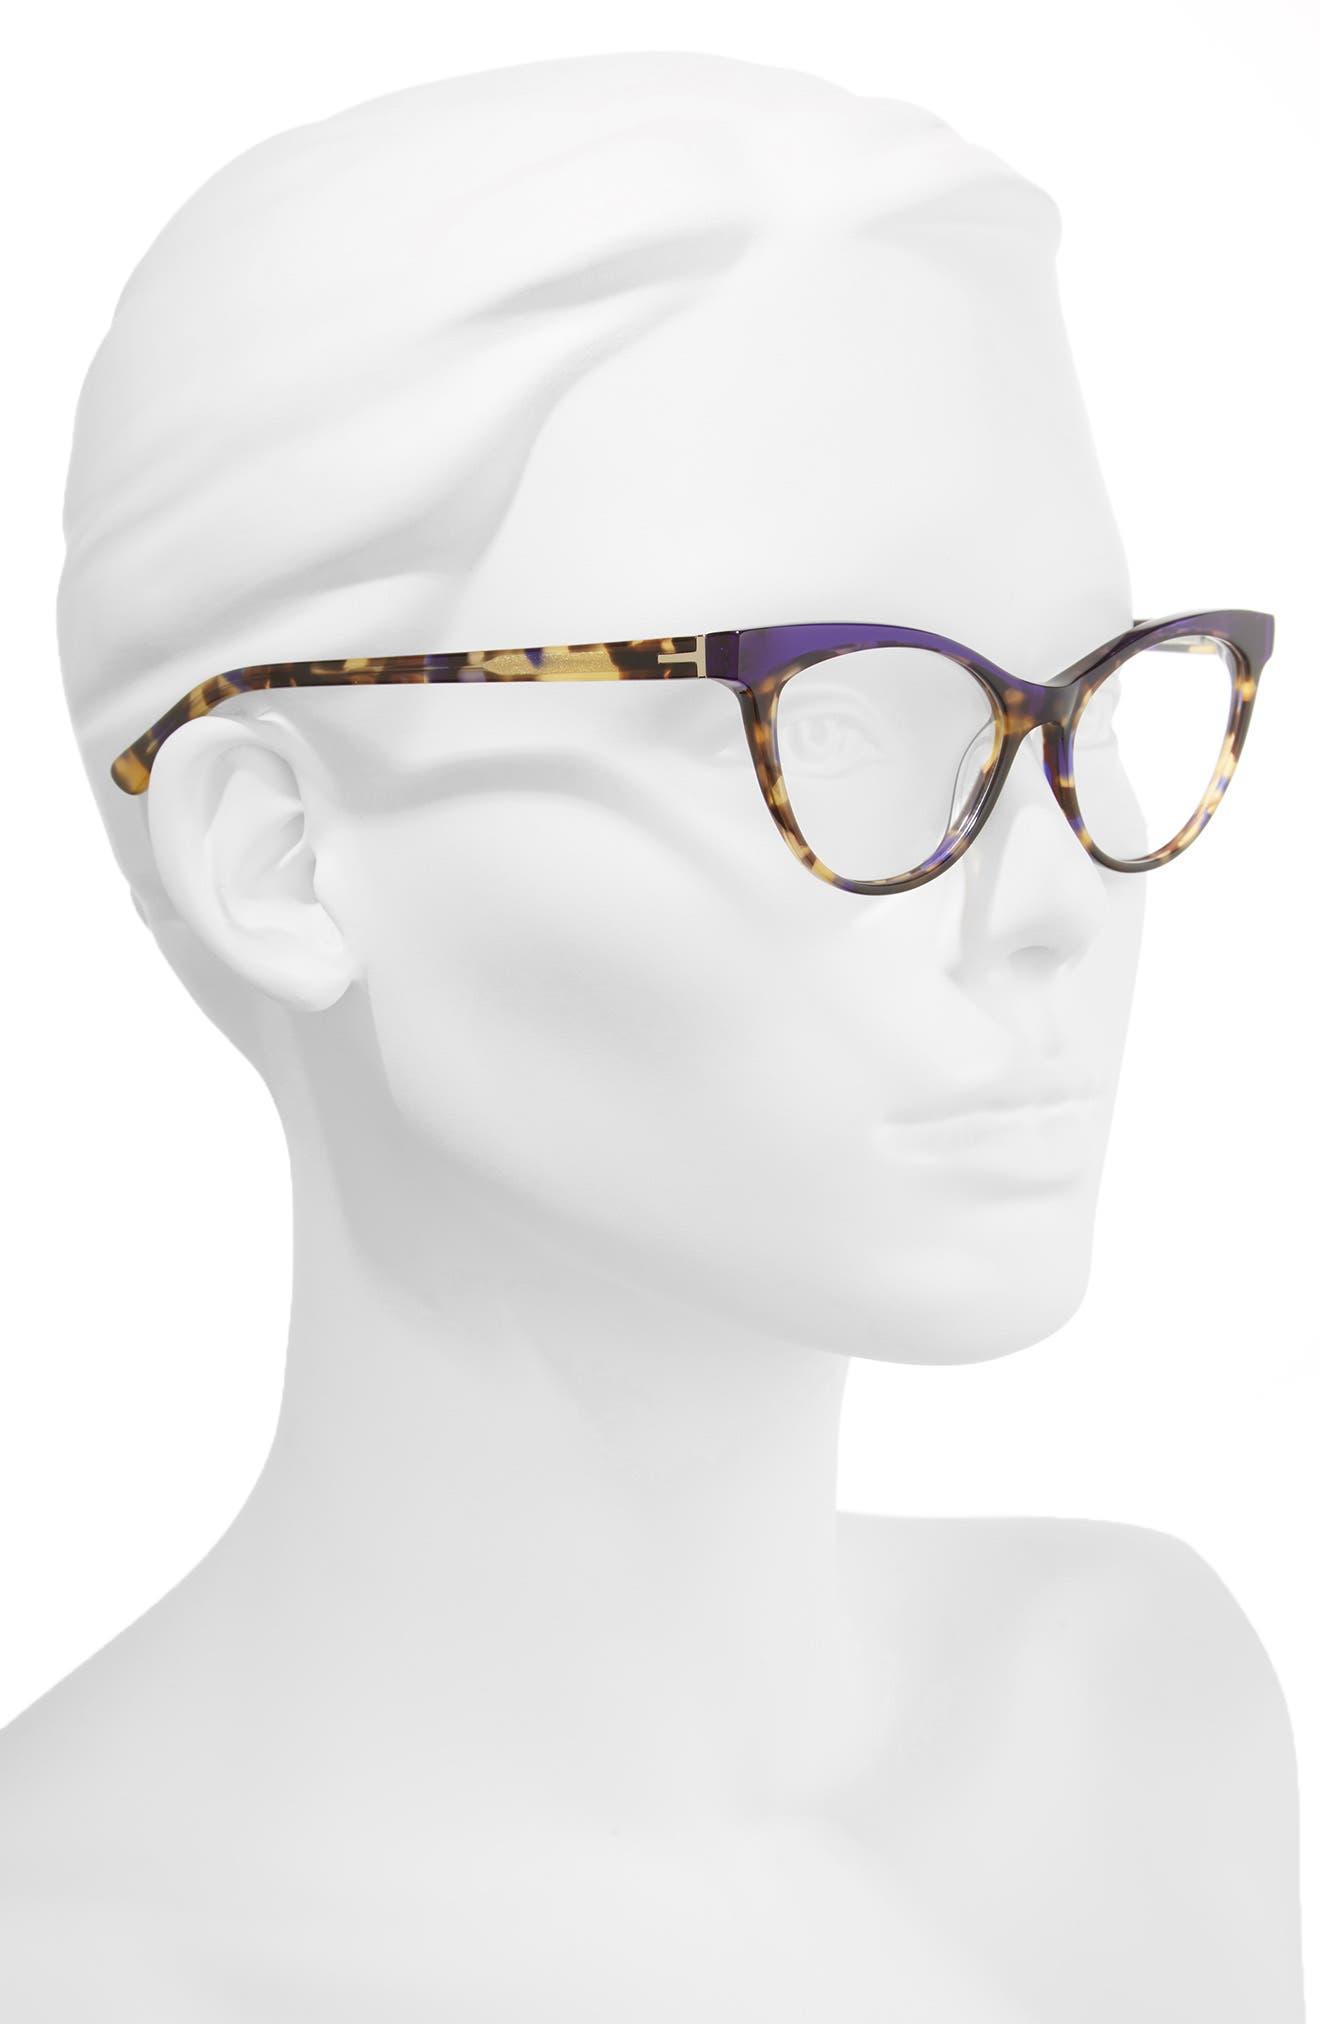 51mm Optical Cat Eye Glasses,                             Alternate thumbnail 2, color,                             Brown